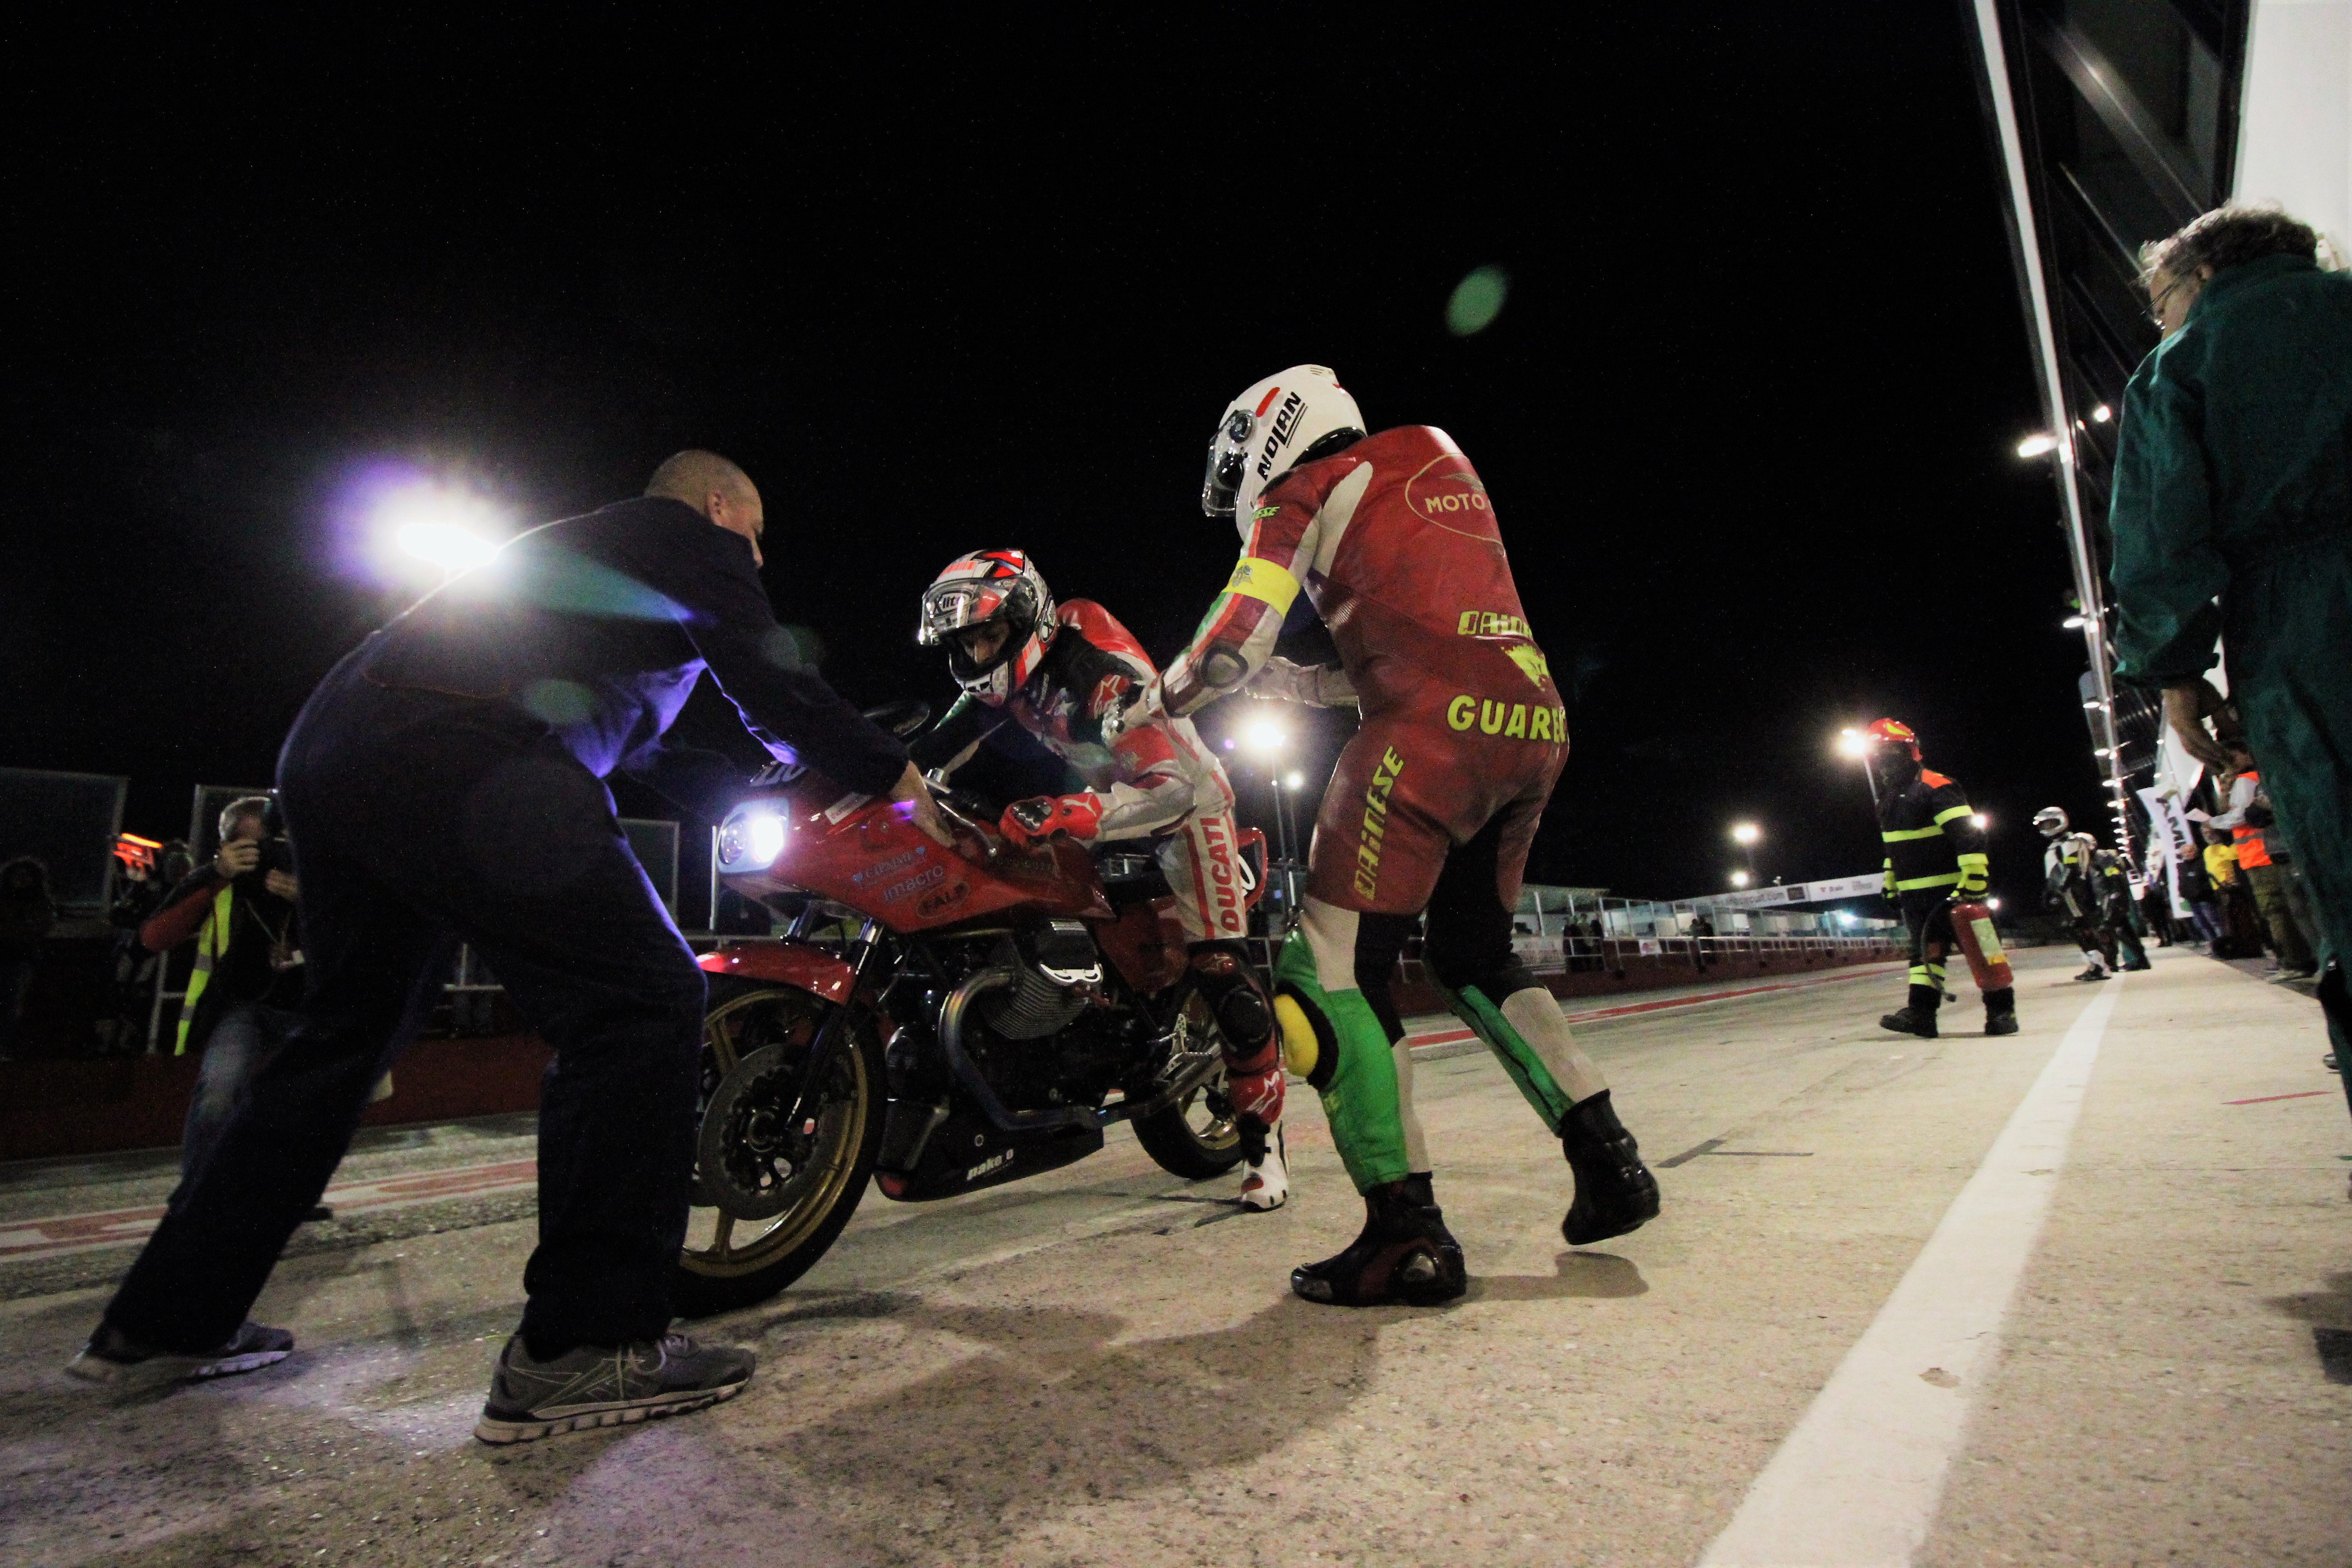 Lo spettacolo del Vintage Endurance in notturna a Misano